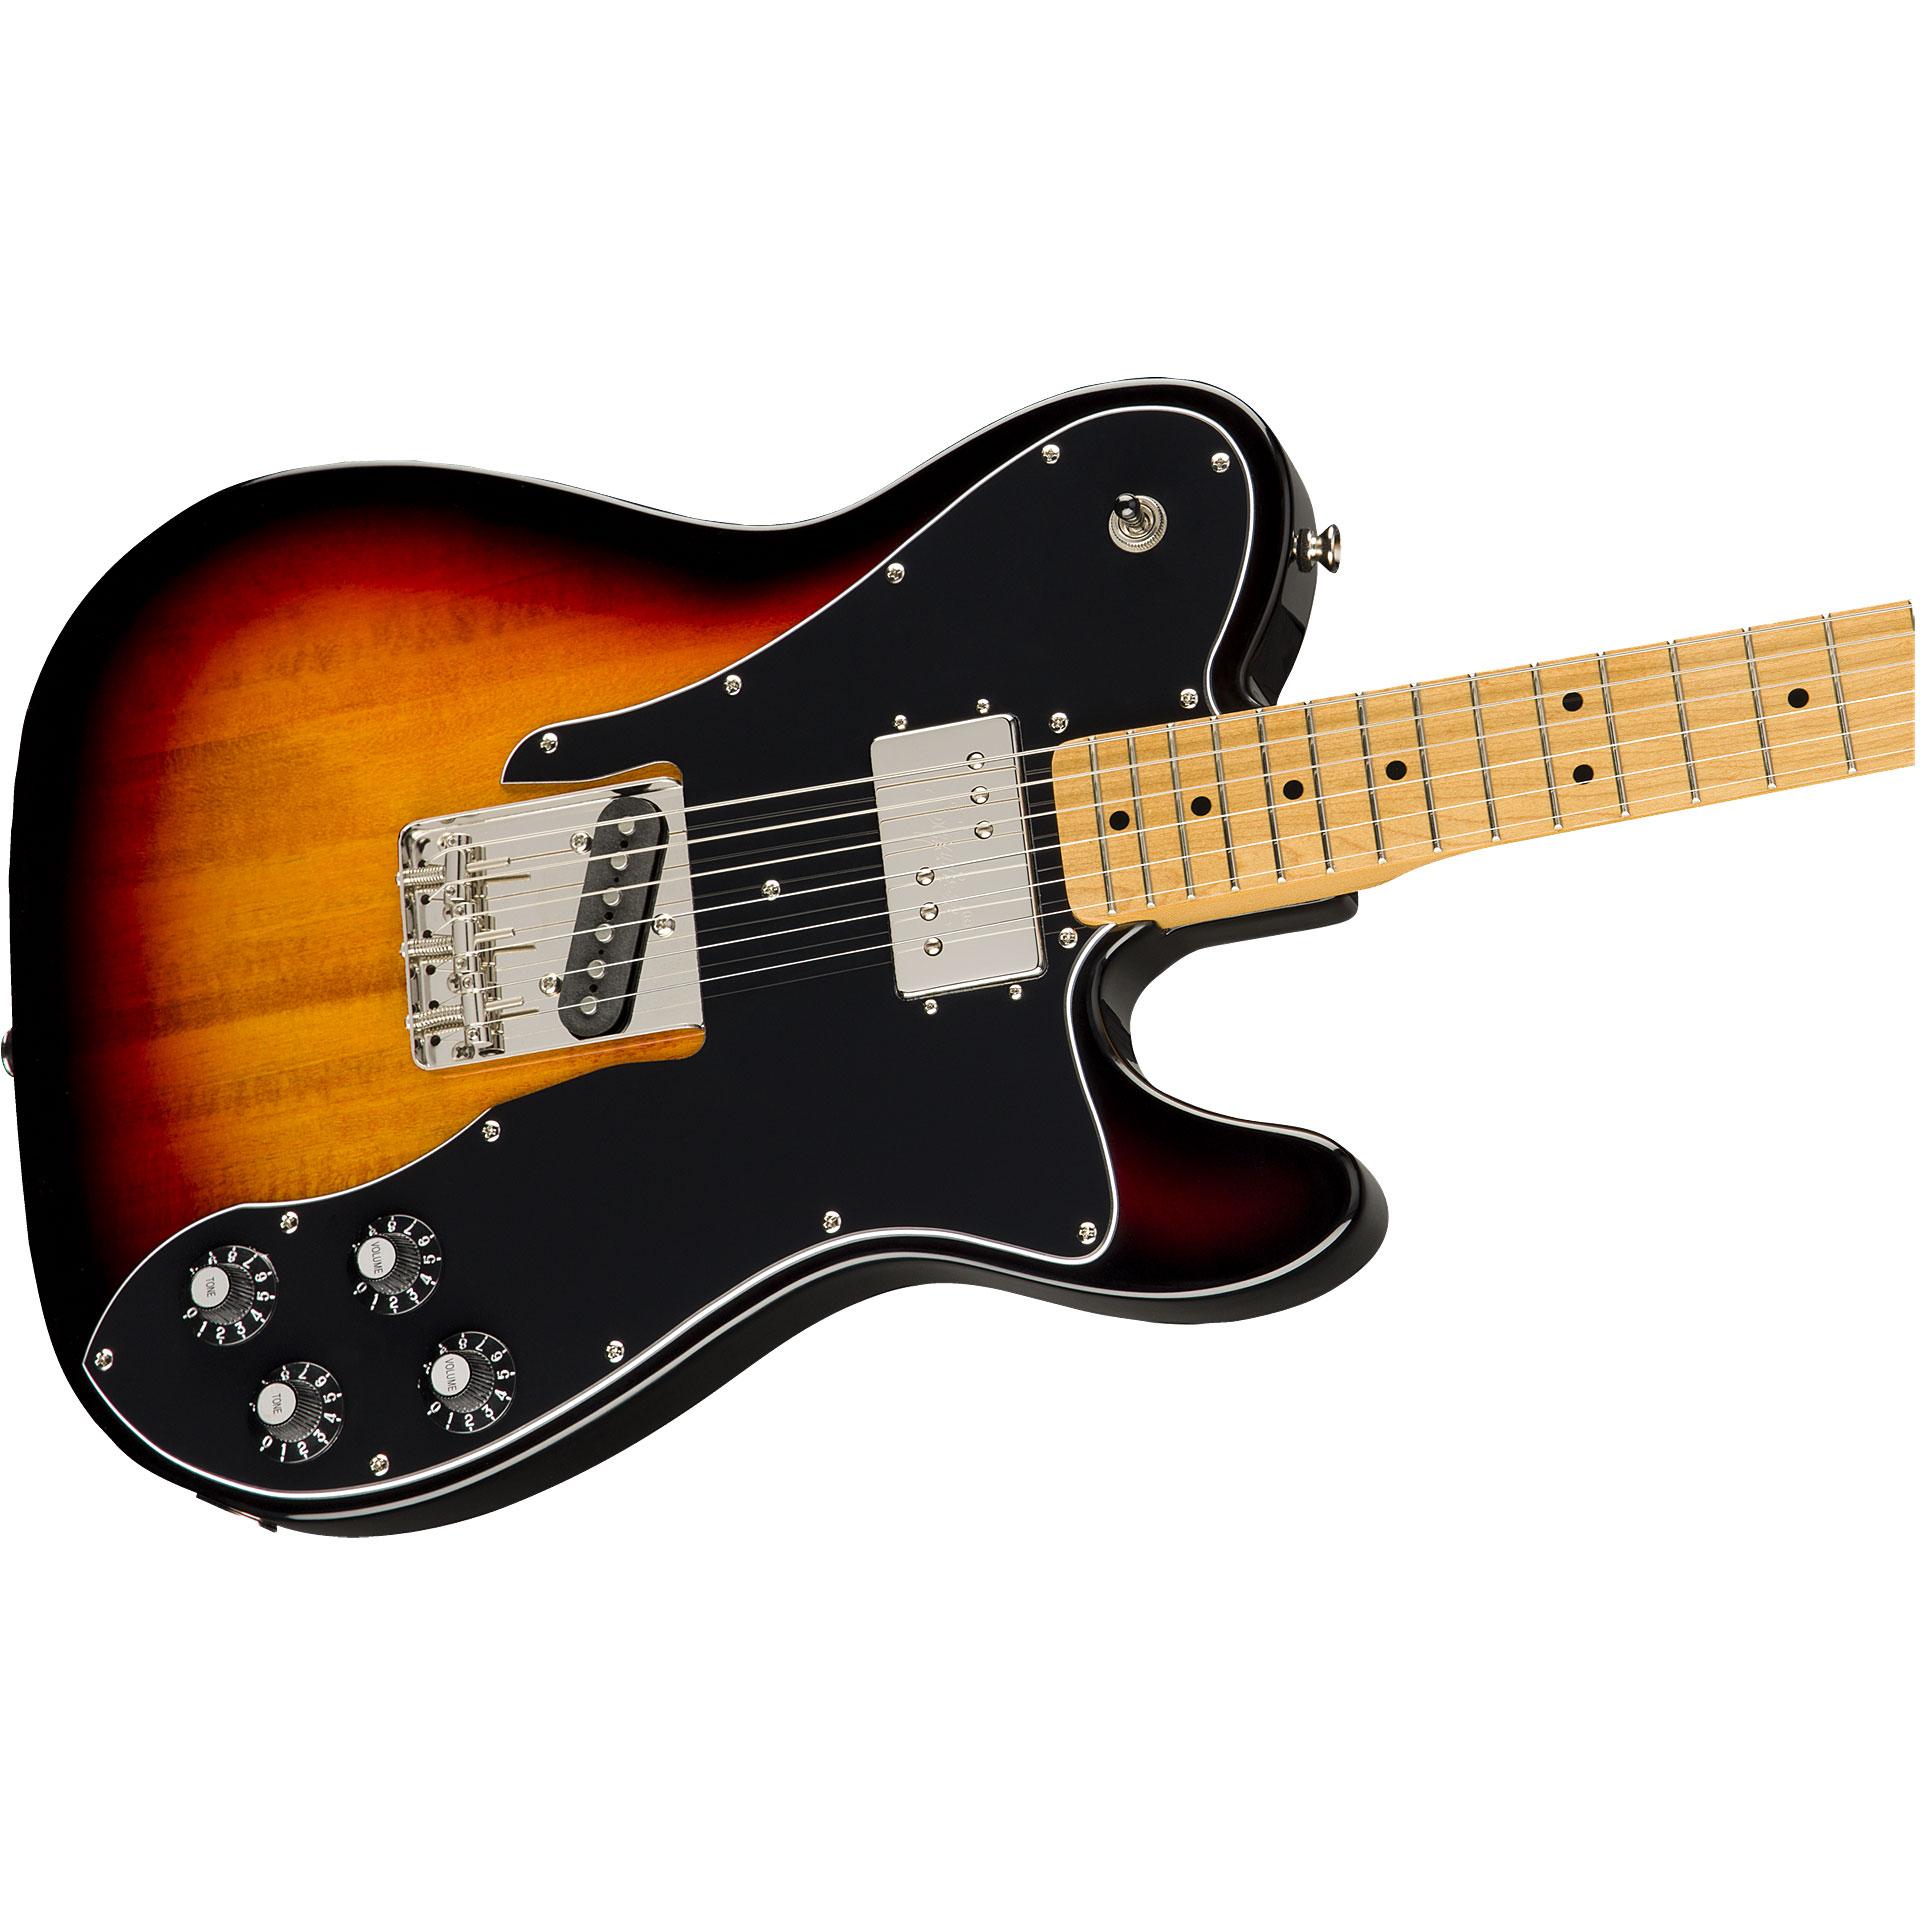 Classic Vibe Tele Custom : squier classic vibe 70s tele custom 3ts electric guitar ~ Russianpoet.info Haus und Dekorationen